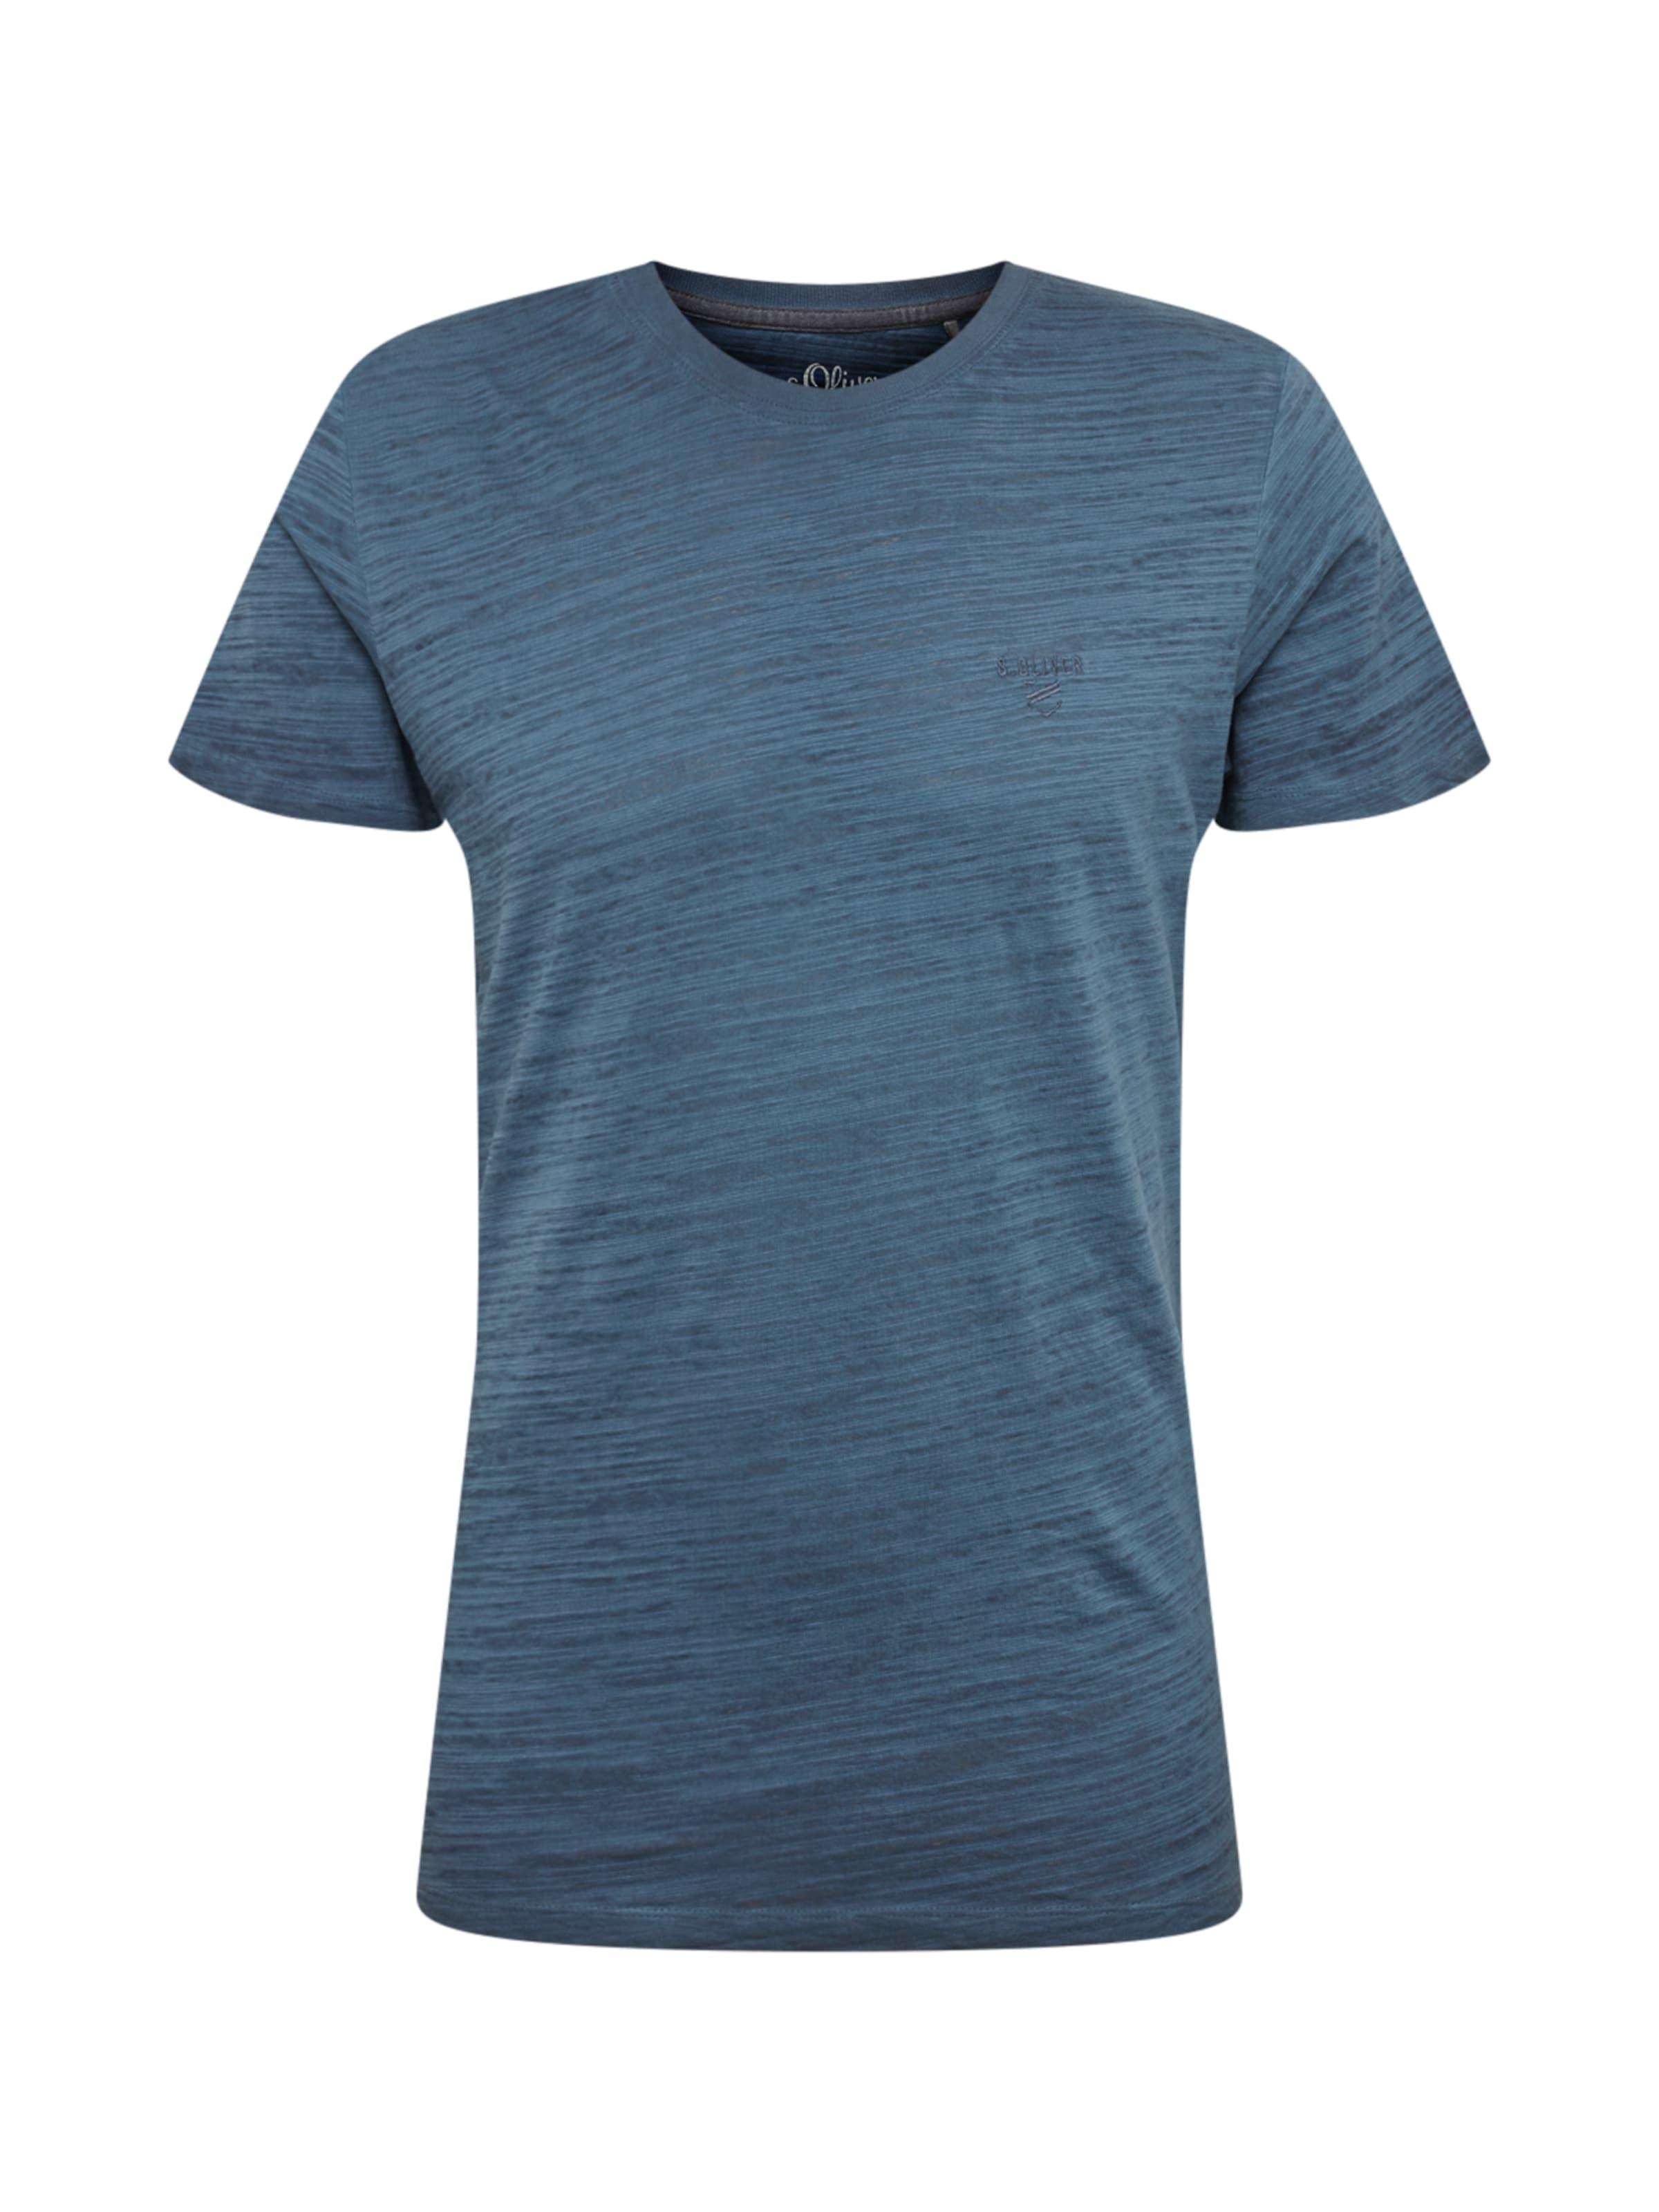 Label Bleu shirt T Foncé oliver Red En S 0wvOmNn8